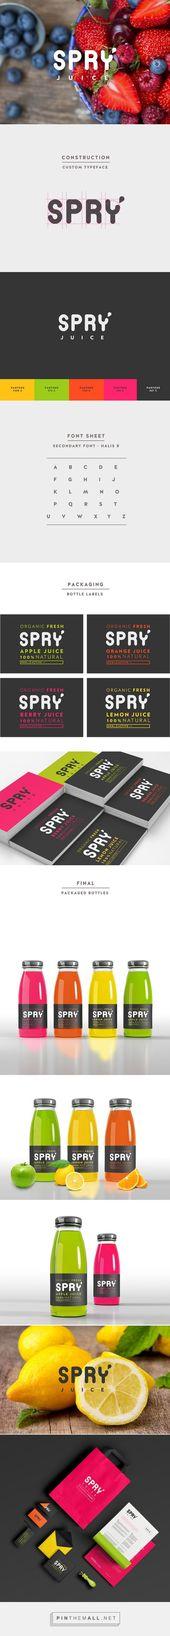 Spry Juice Branding en Behance   Fivestar Branding – Agencia de diseño y branding …   – Graphic Design